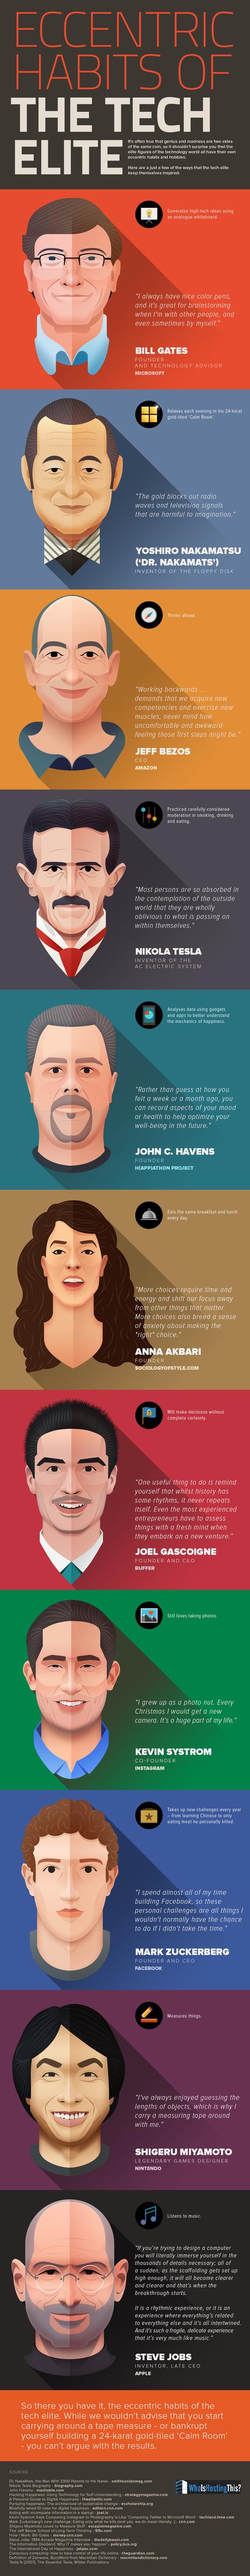 Eccentric Habits of Tech Geniuses Infographic | Information Powerhouses | Scoop.it